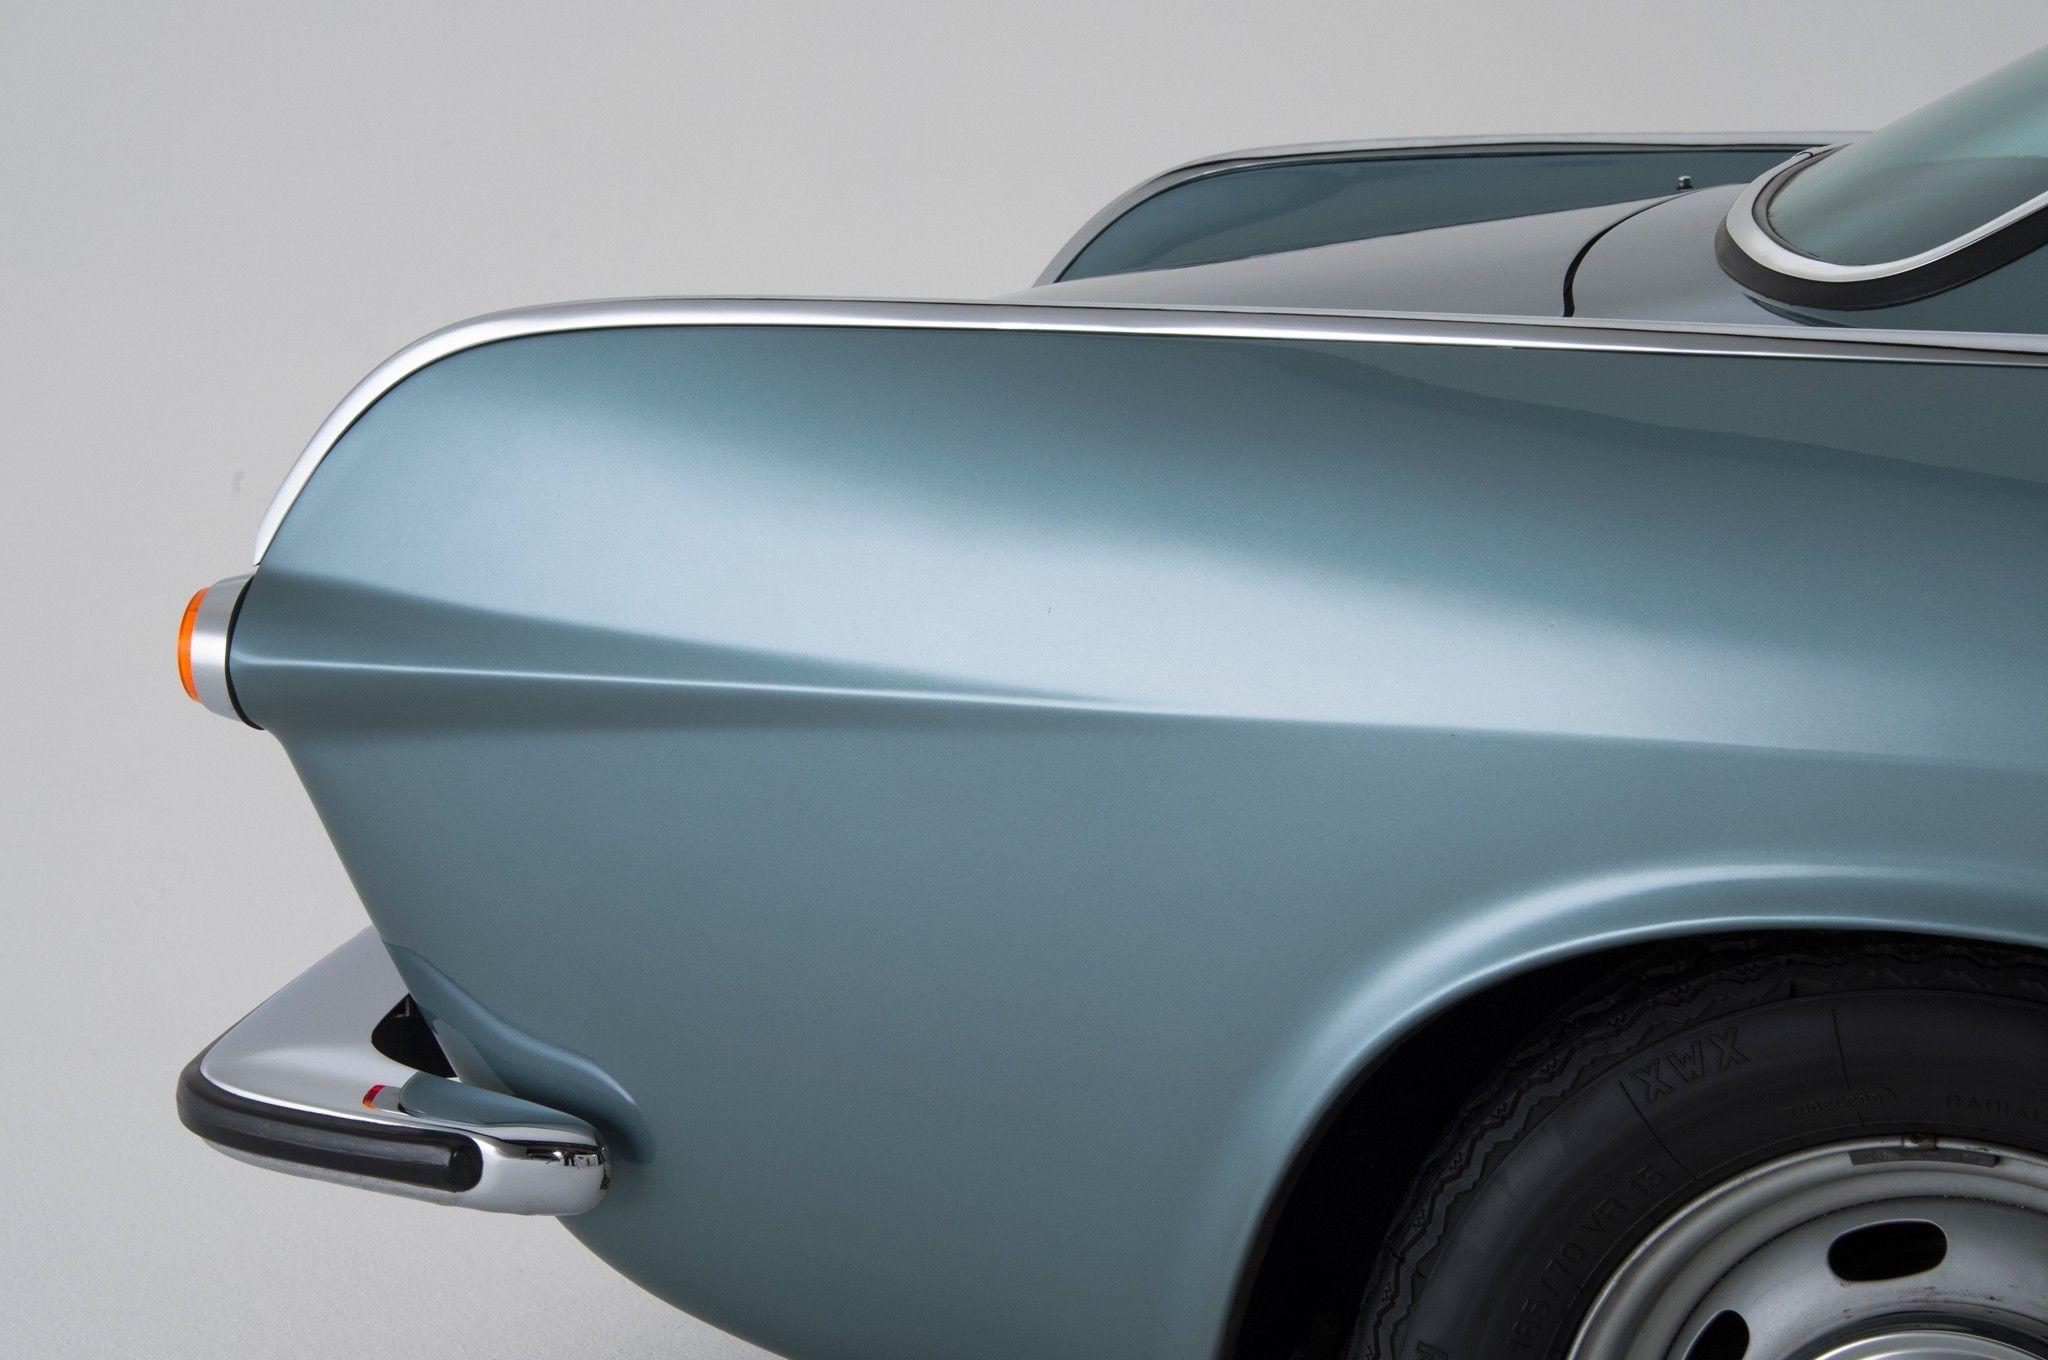 Pin by Jan Krofta on P1800 Volvo coupe, Volvo p1800s, Volvo